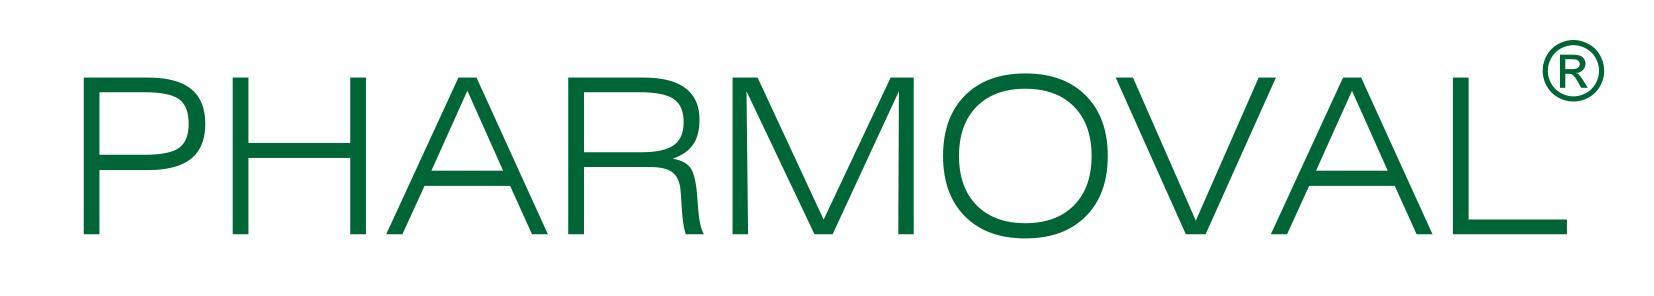 Pharmoval logo